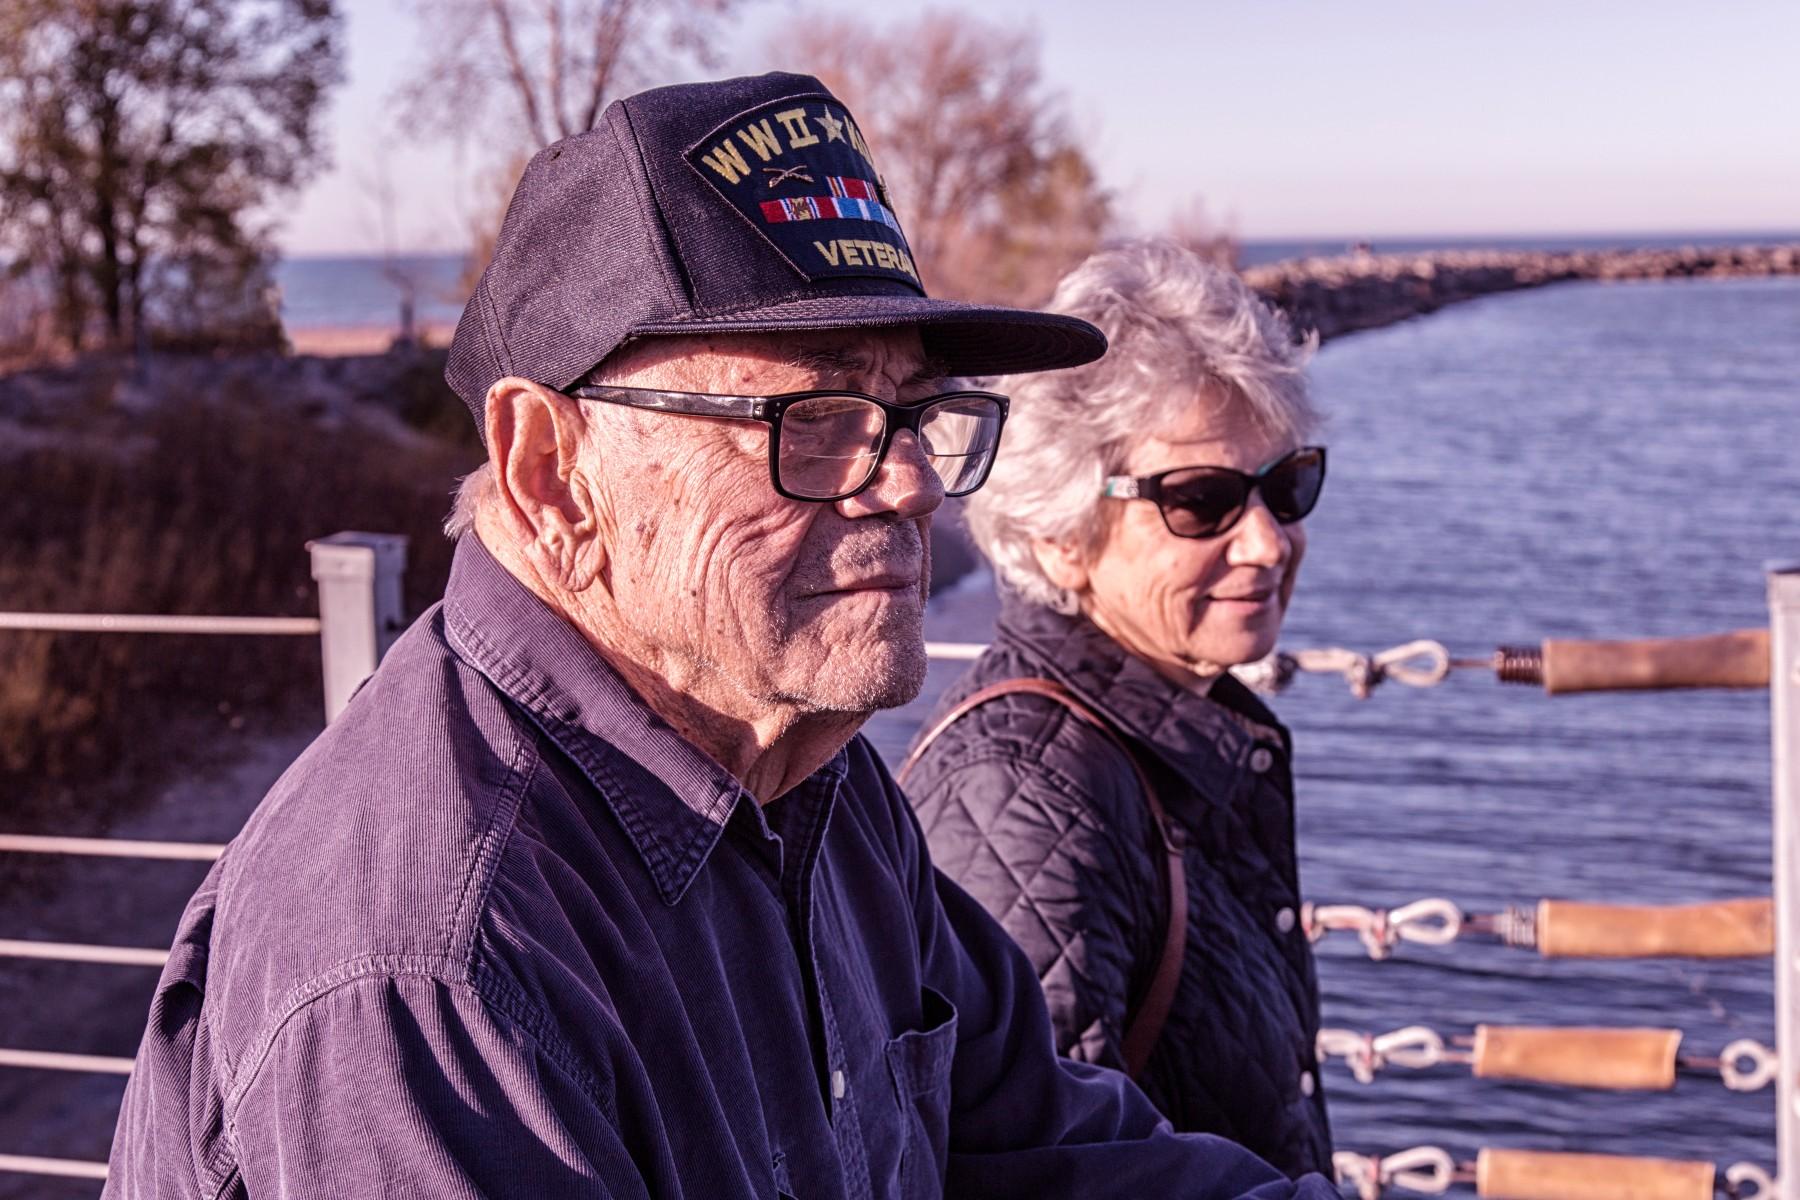 Senior Veteran and his wife leisurely watching water